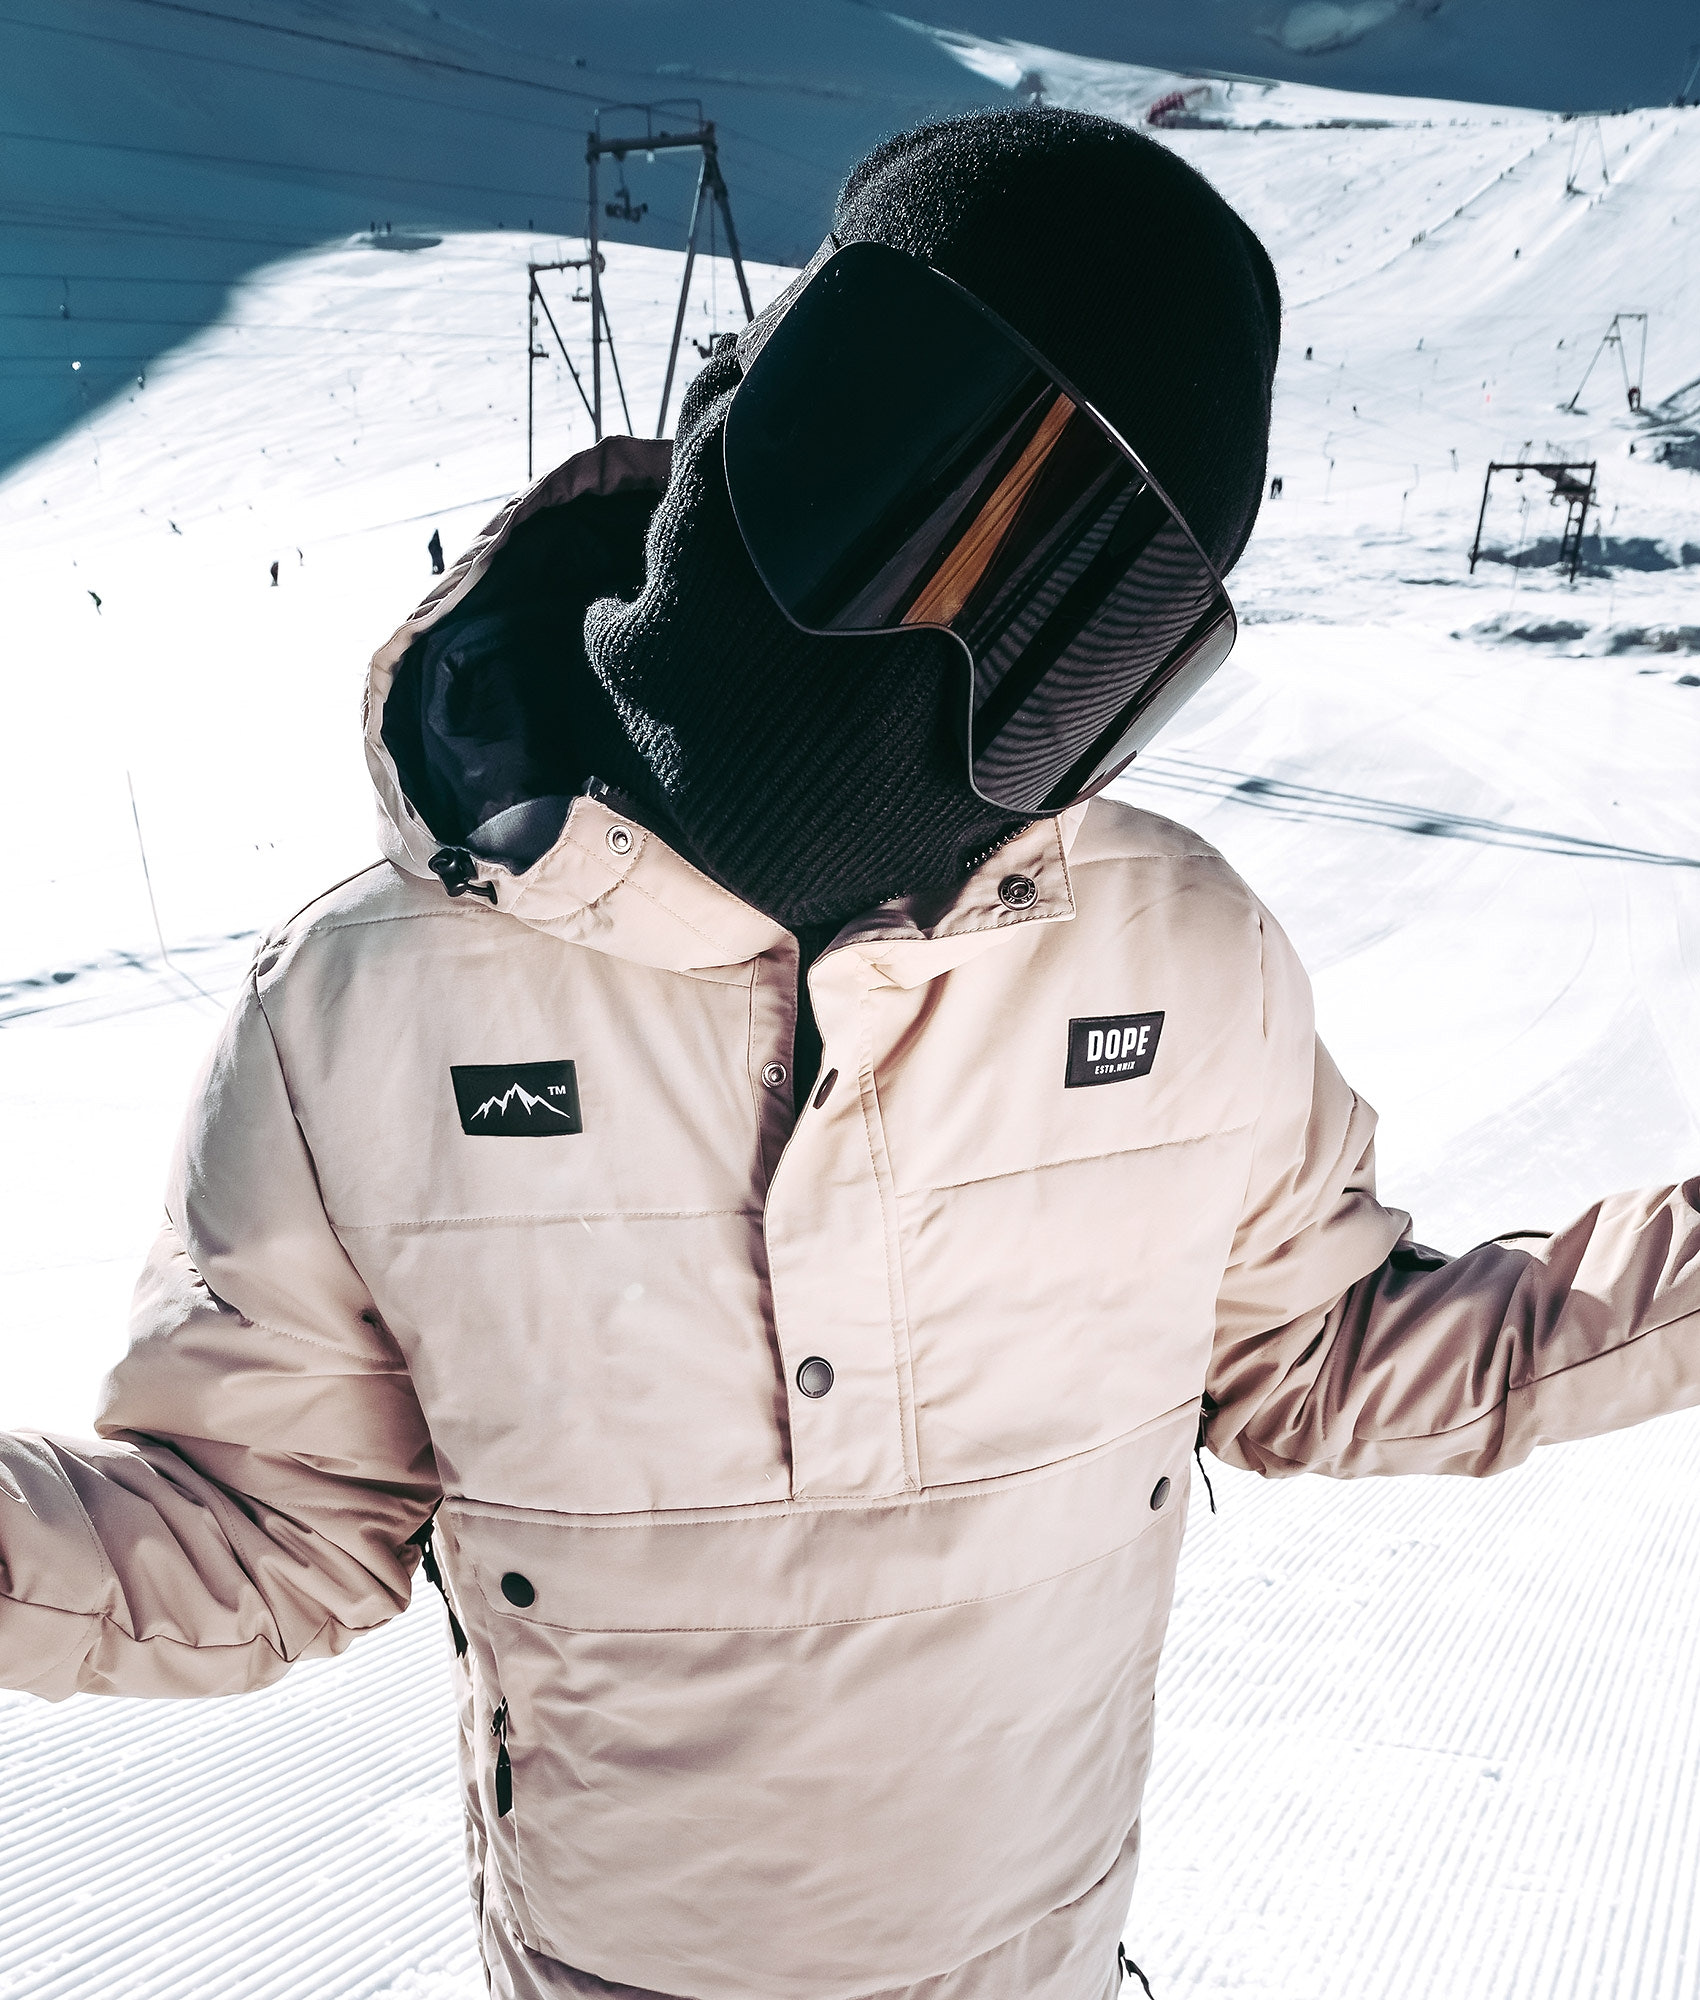 ed5ad8f927e5 Dope Puffer Snowboard Jacket Sand - Ridestore.com